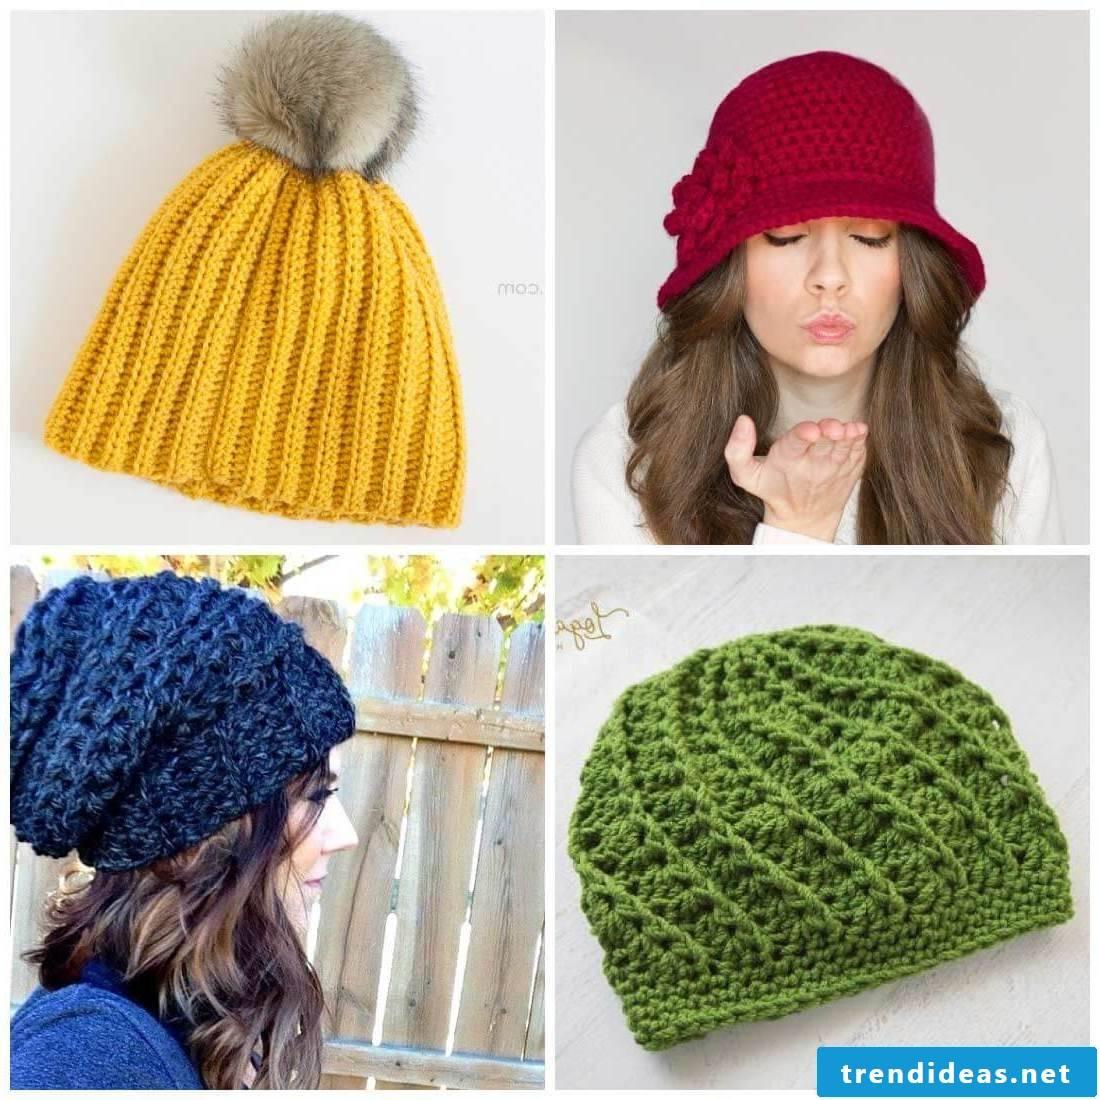 Knit cap - anyone can